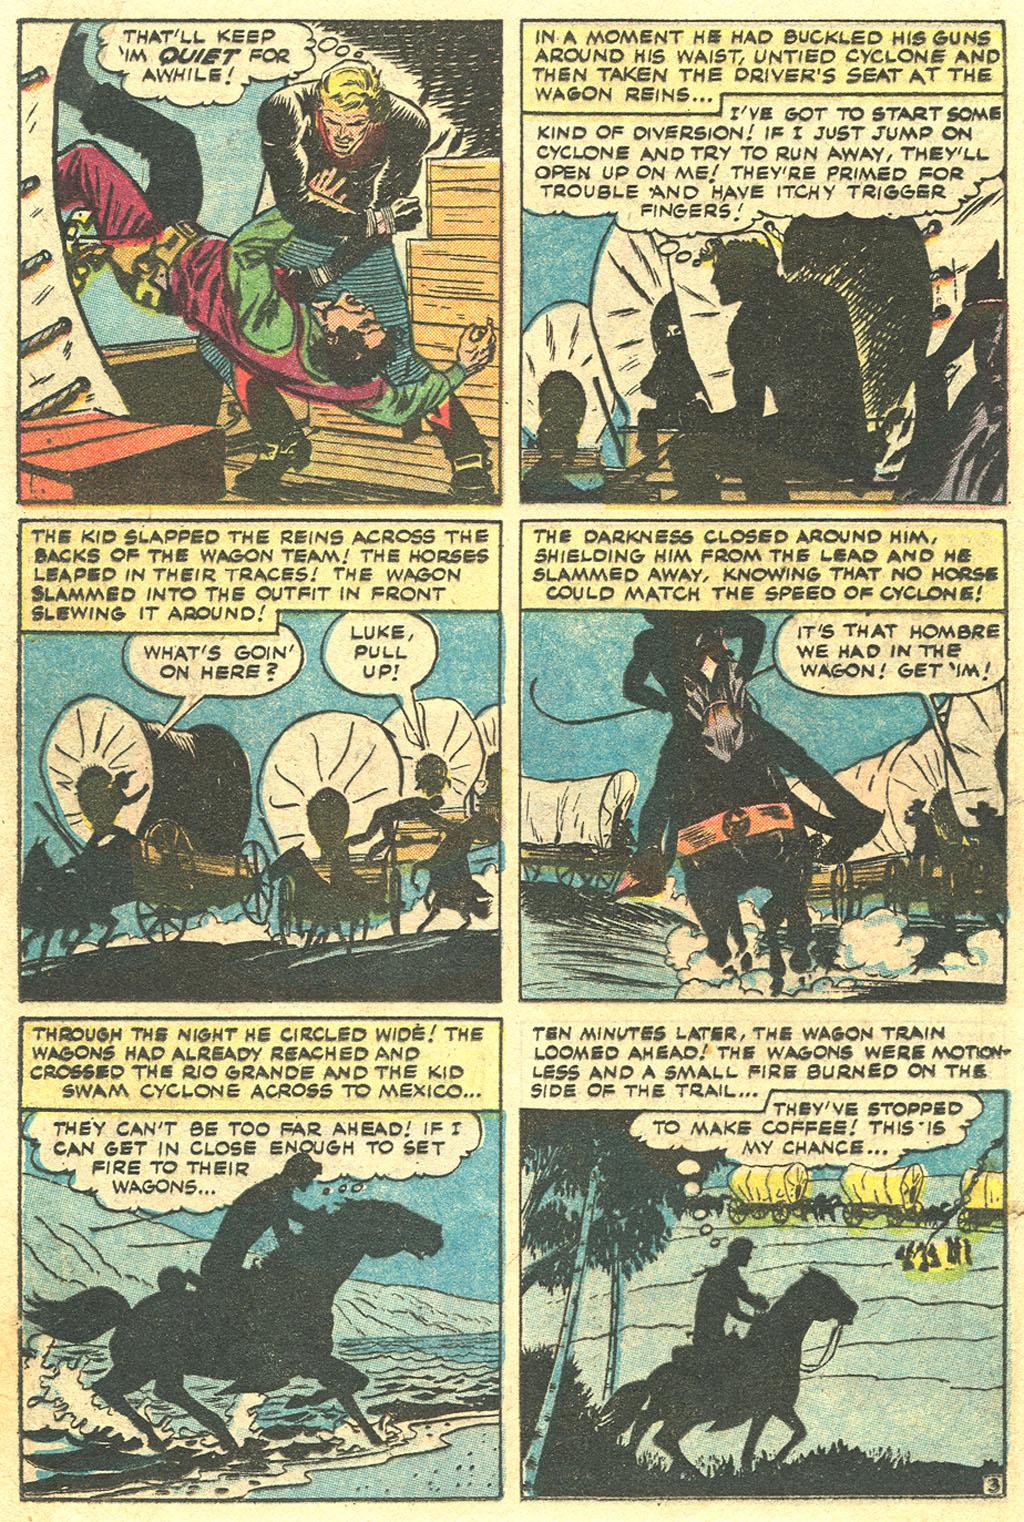 Read online Two-Gun Kid comic -  Issue #29 - 12